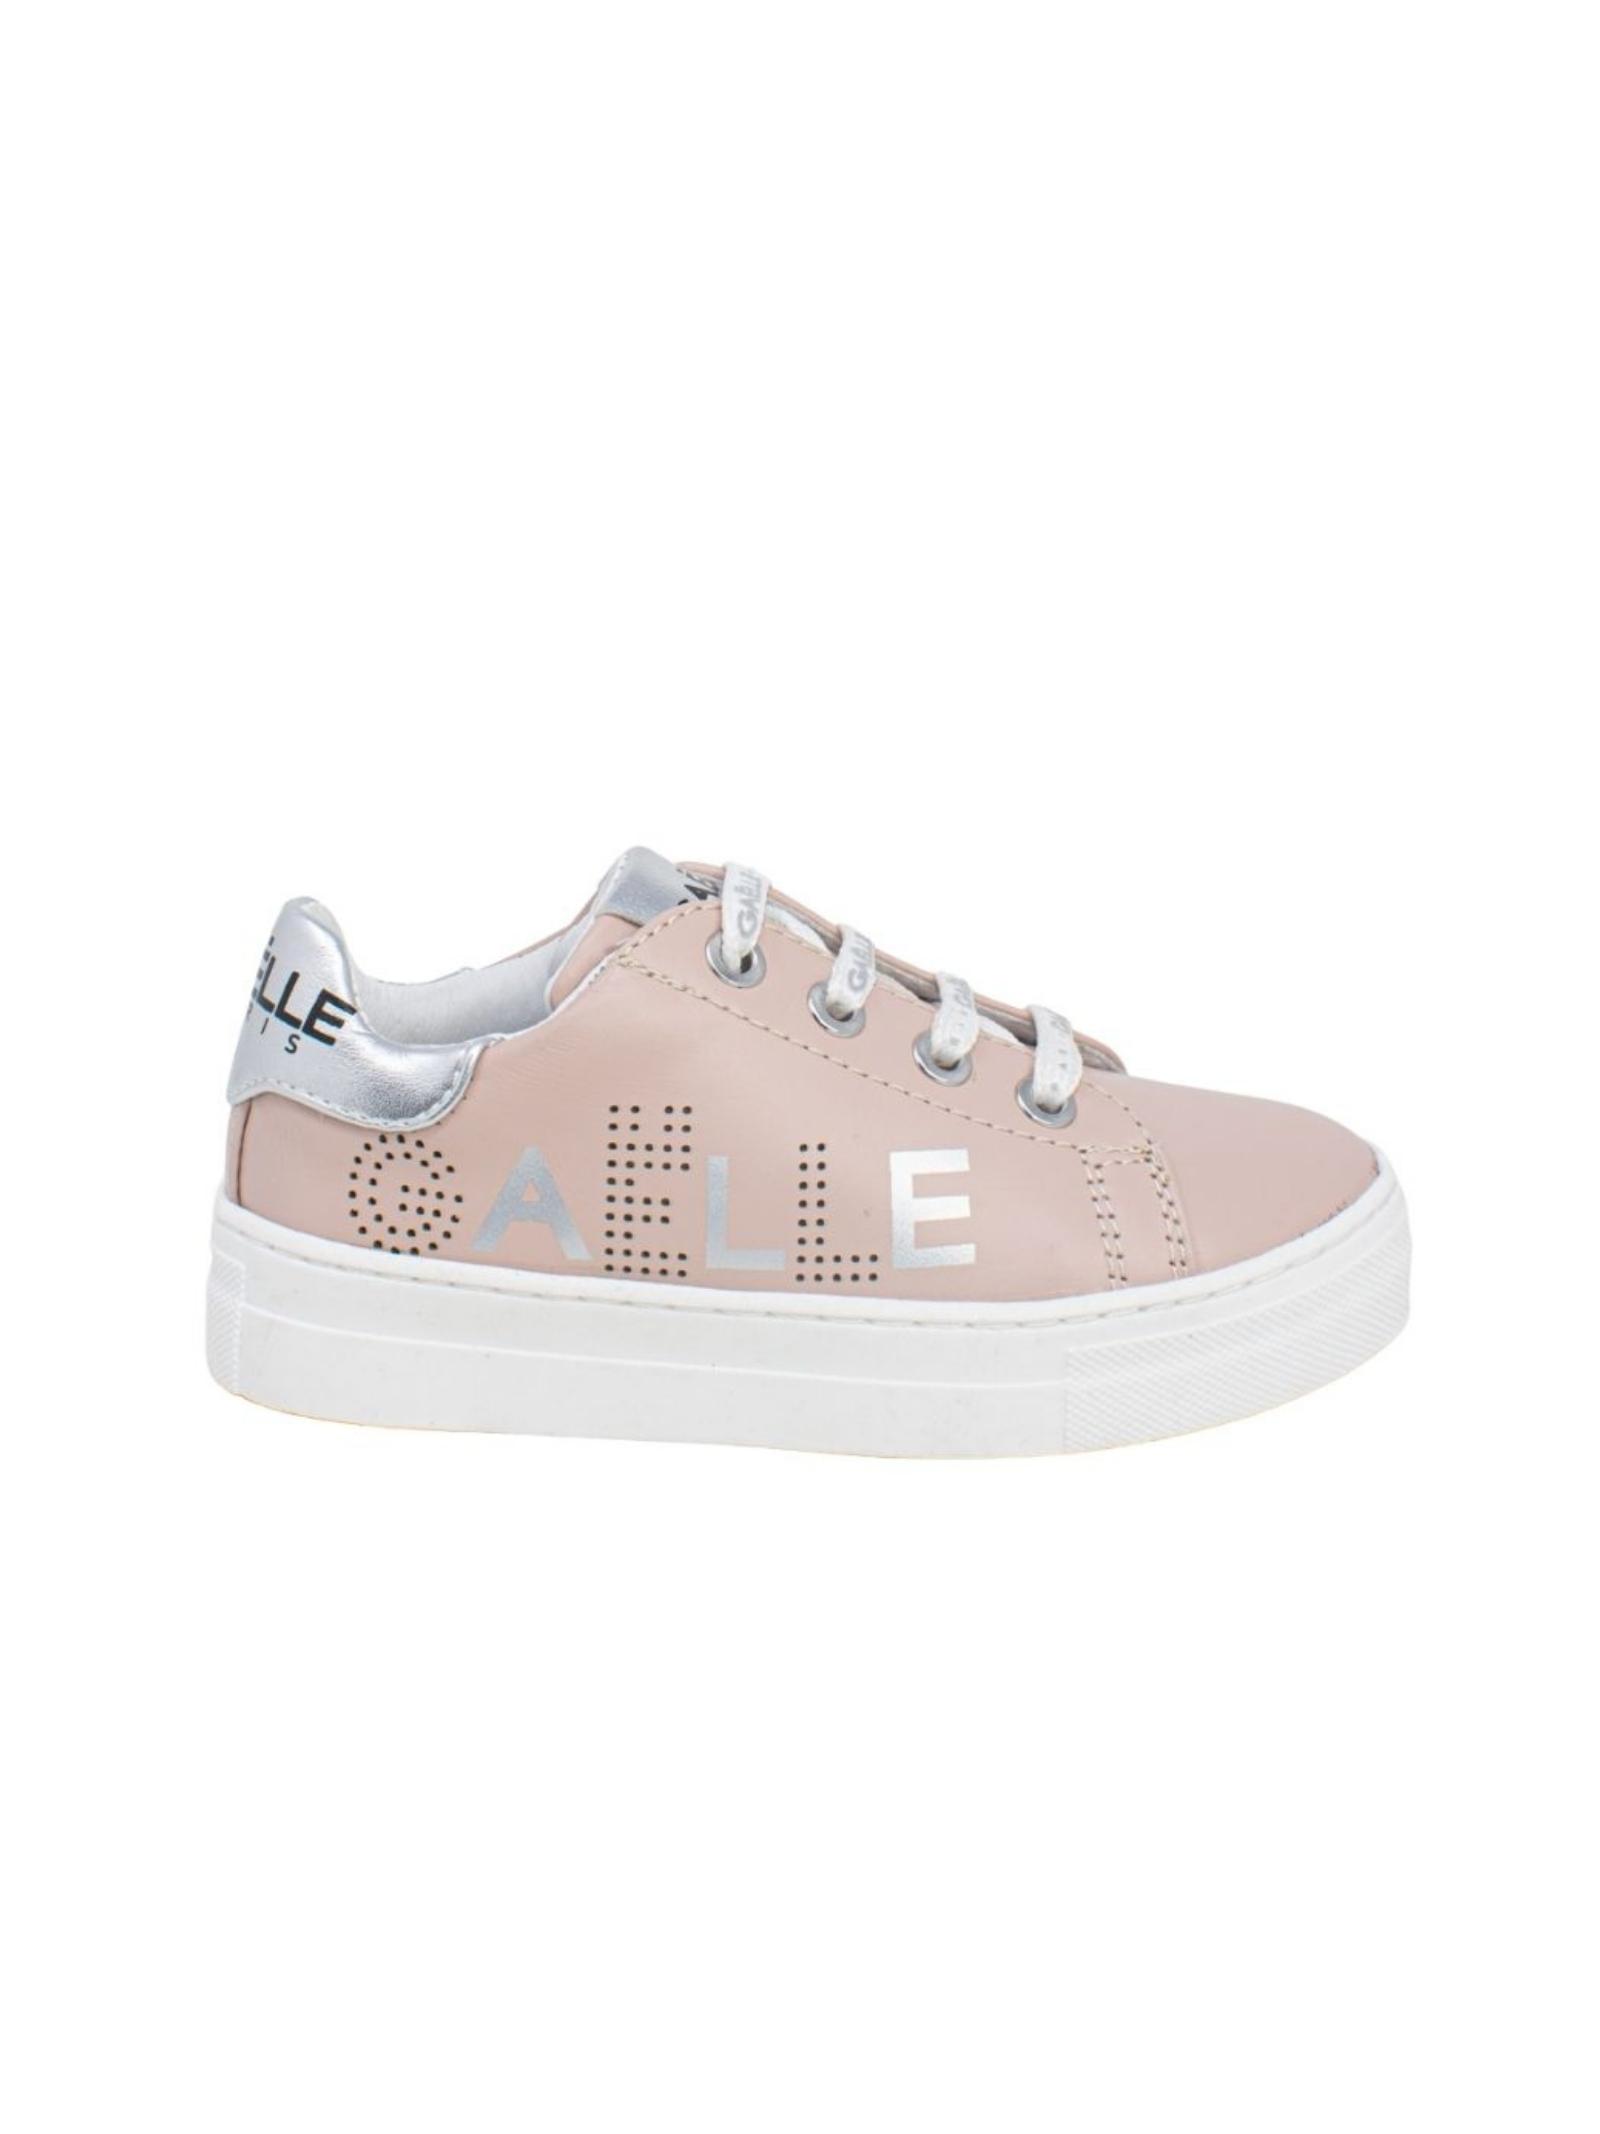 Sneakers Bambina Pink GAËLLE PARIS KIDS | Sneakers | G601PINK